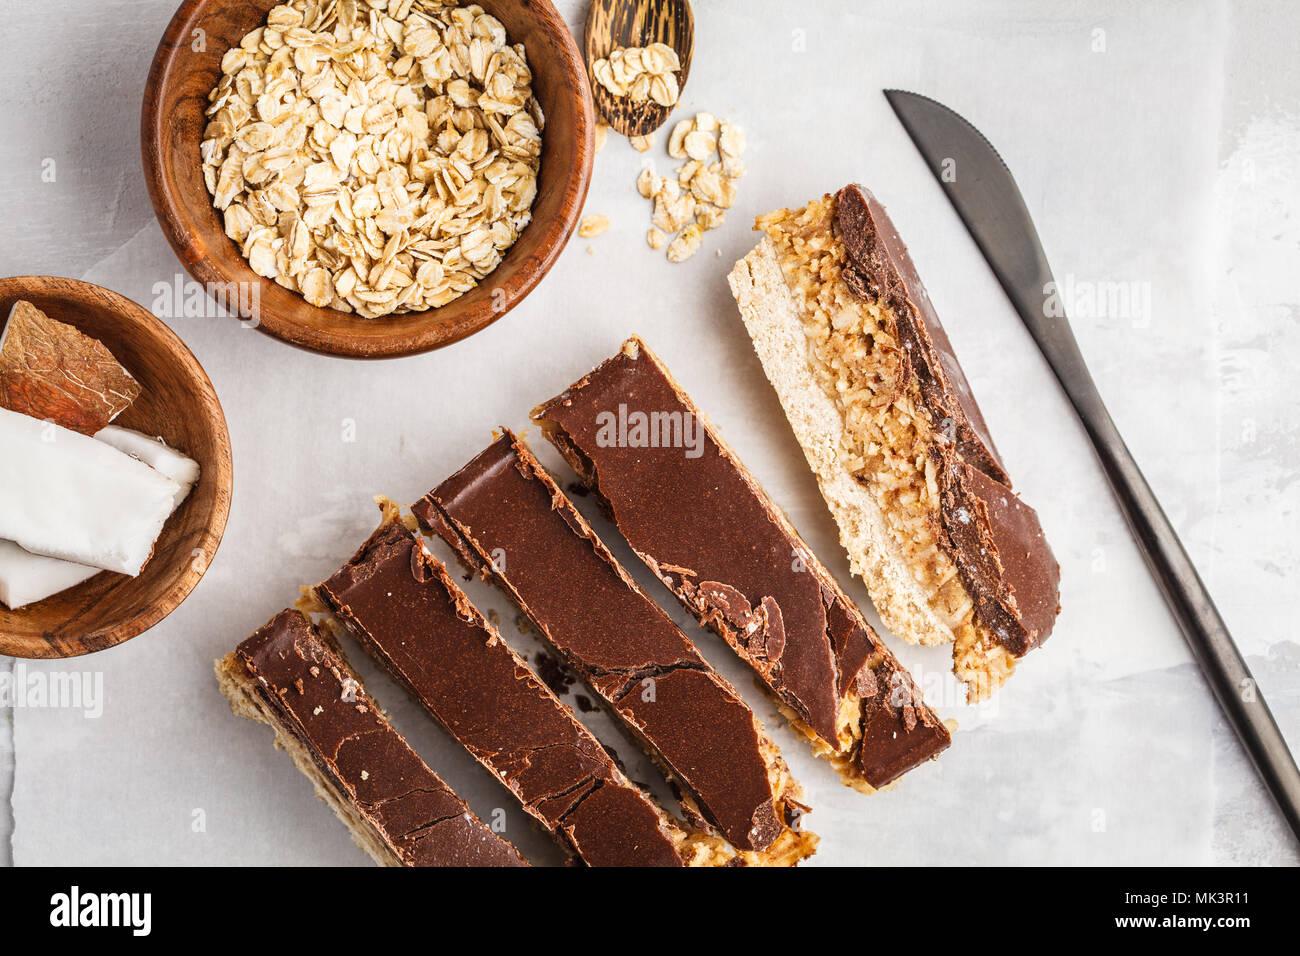 Coconut-oat raw vegan bars. Top view, copy space. Healthy vegan food concept. - Stock Image